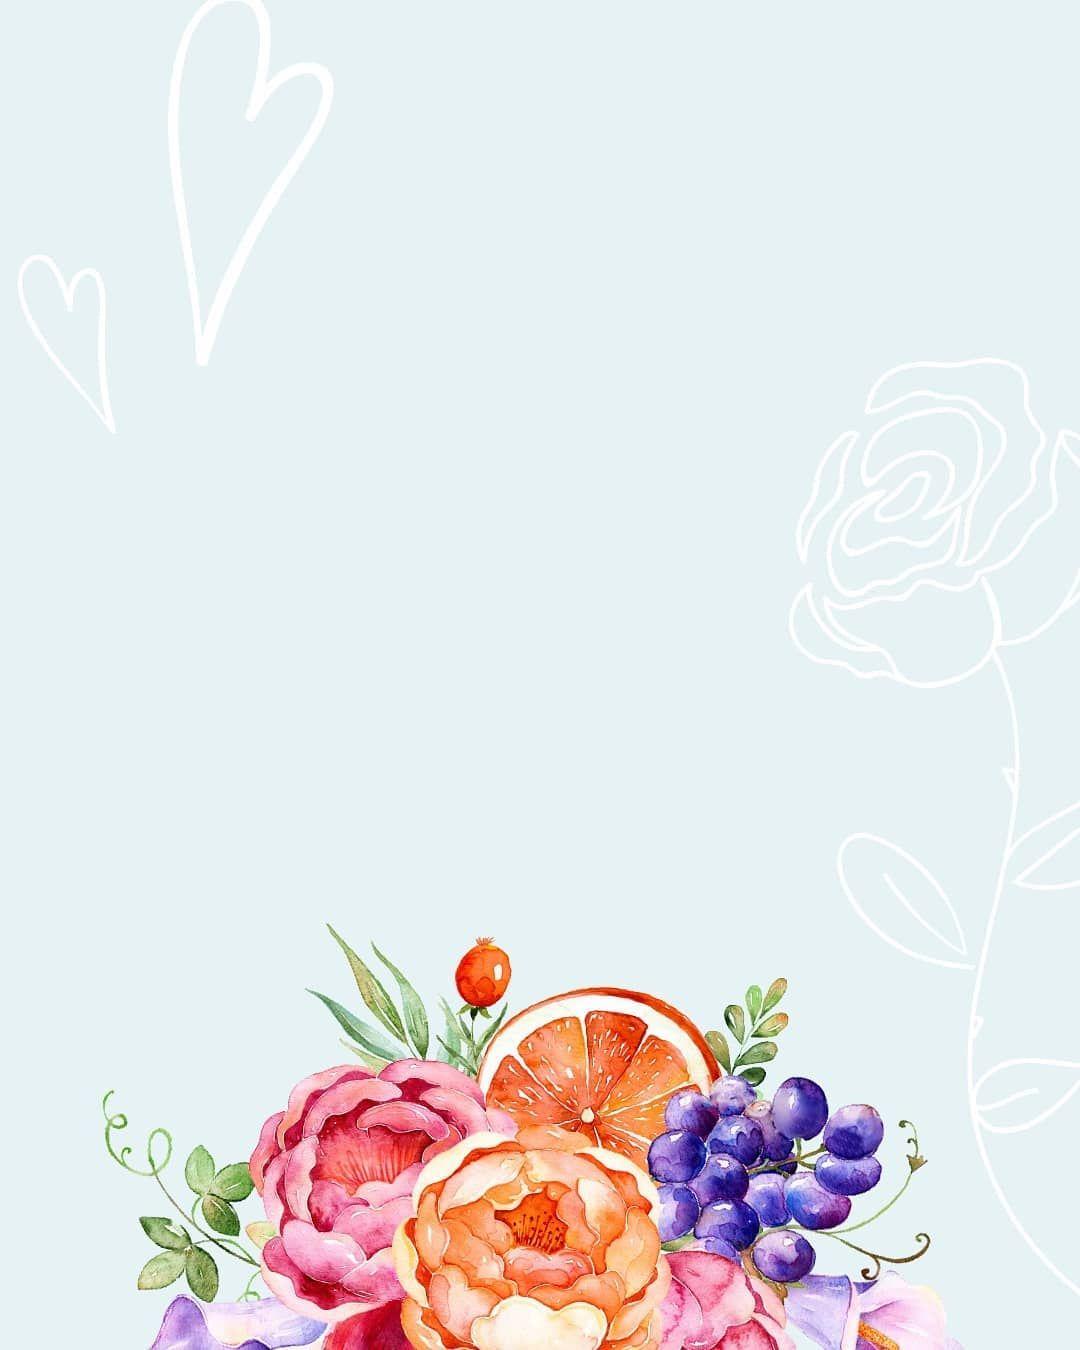 34 Begenme 0 Yorum Instagram Da رمزيات لتصميم 3toofh6 Flower Background Wallpaper Print Design Art Flower Backgrounds